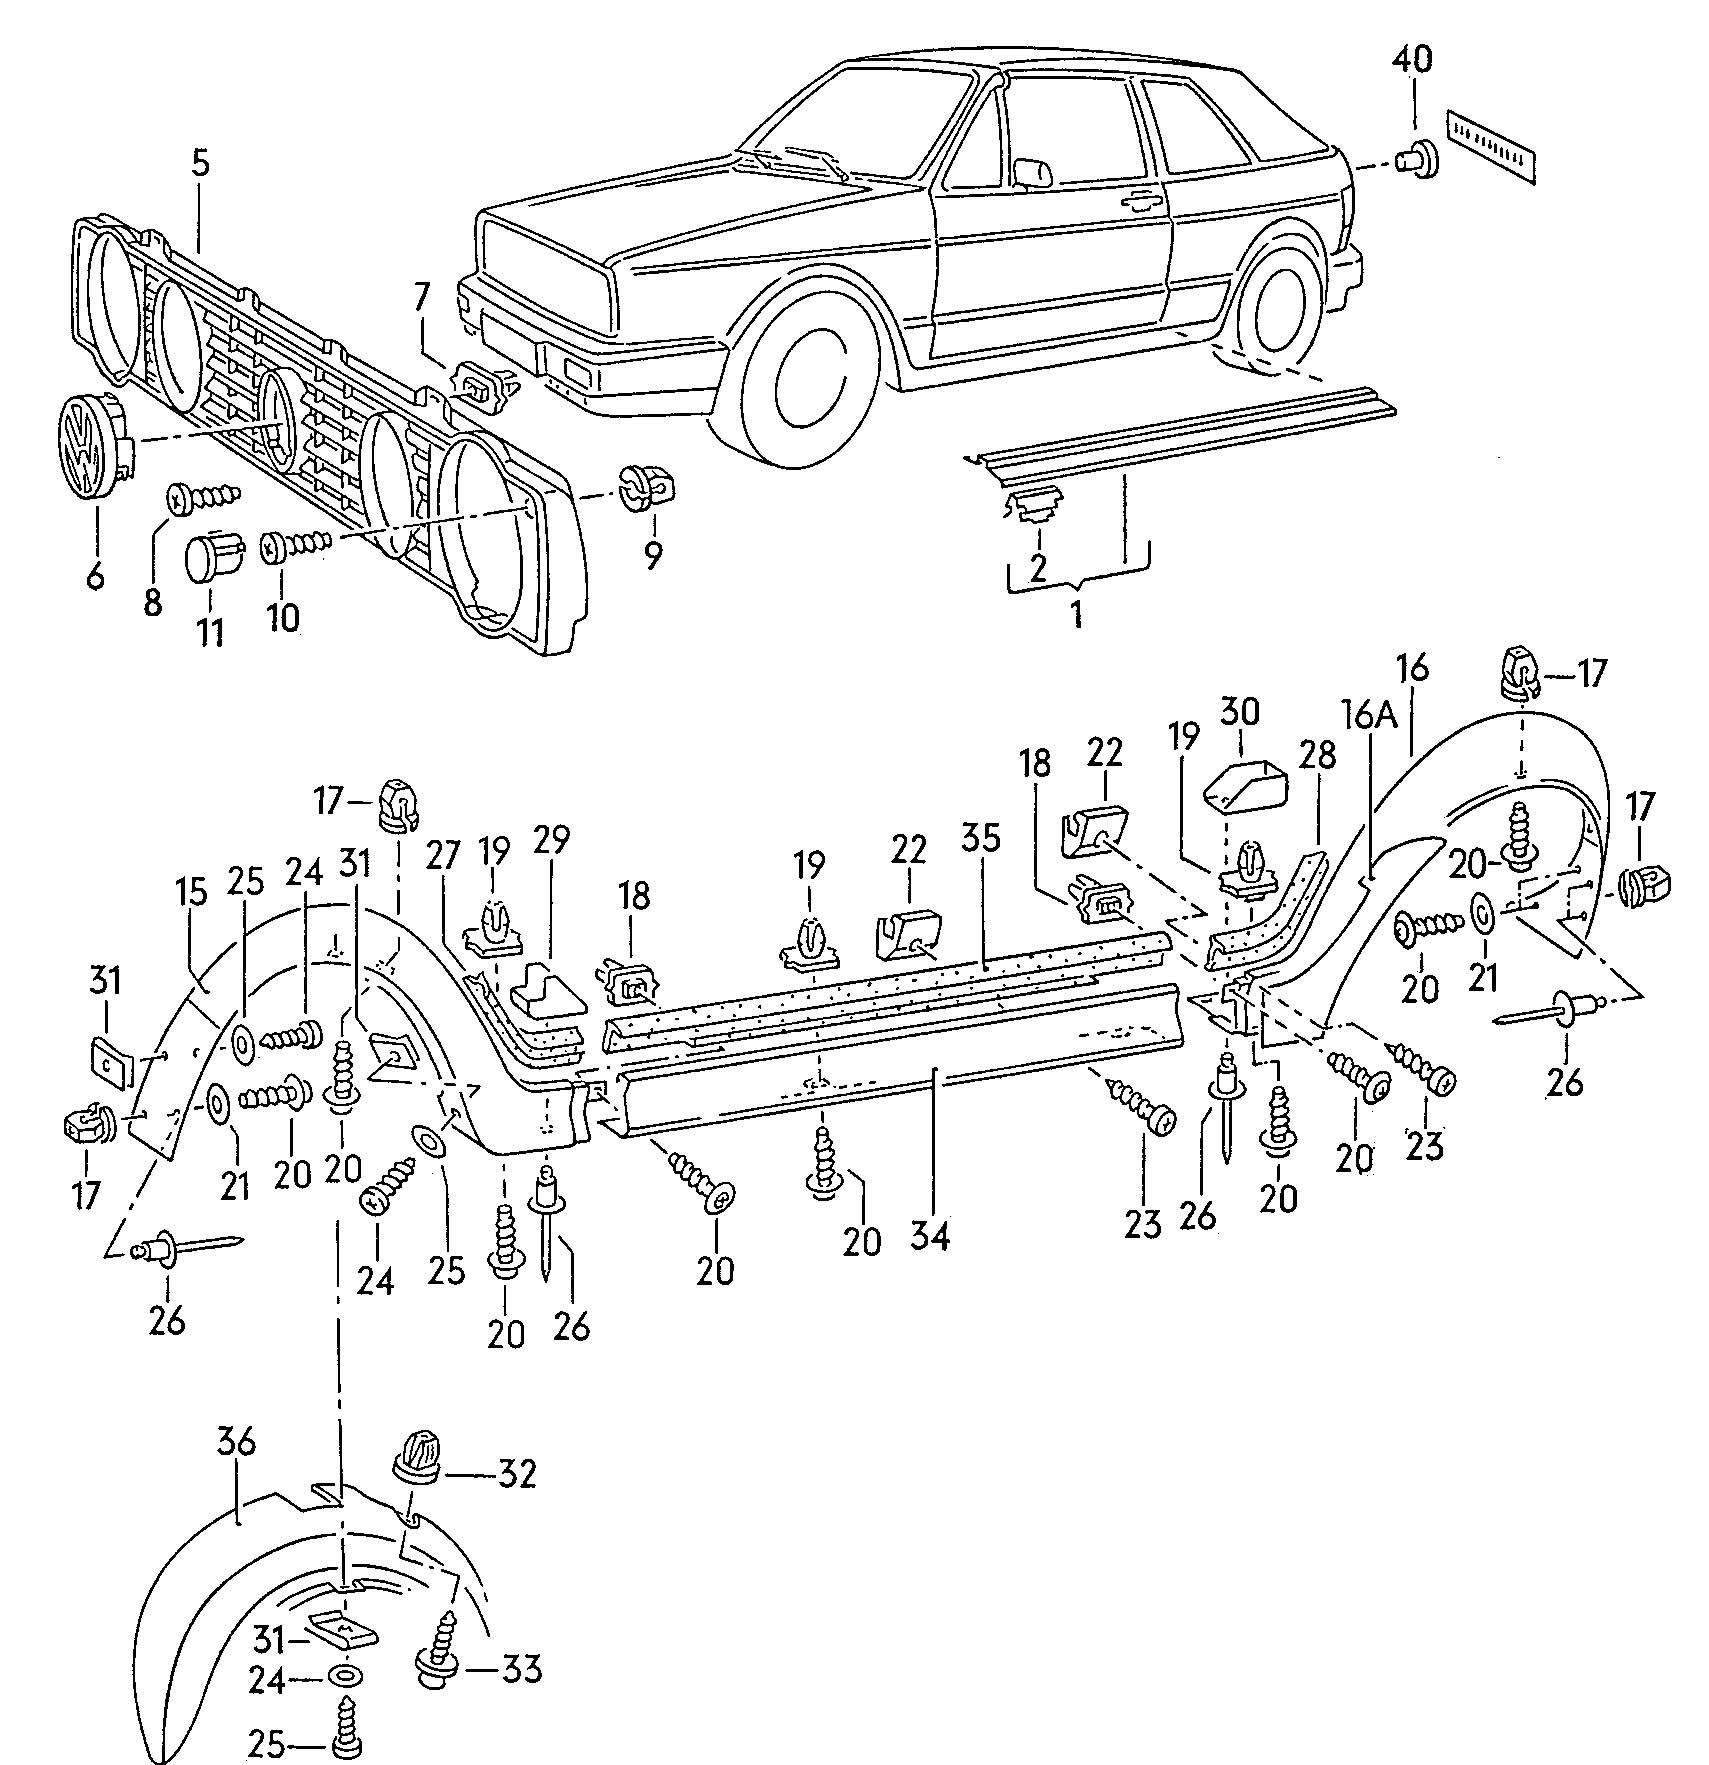 Volkswagen Cabrio/Cabriolet 1.8L K-Jetronic Radiator